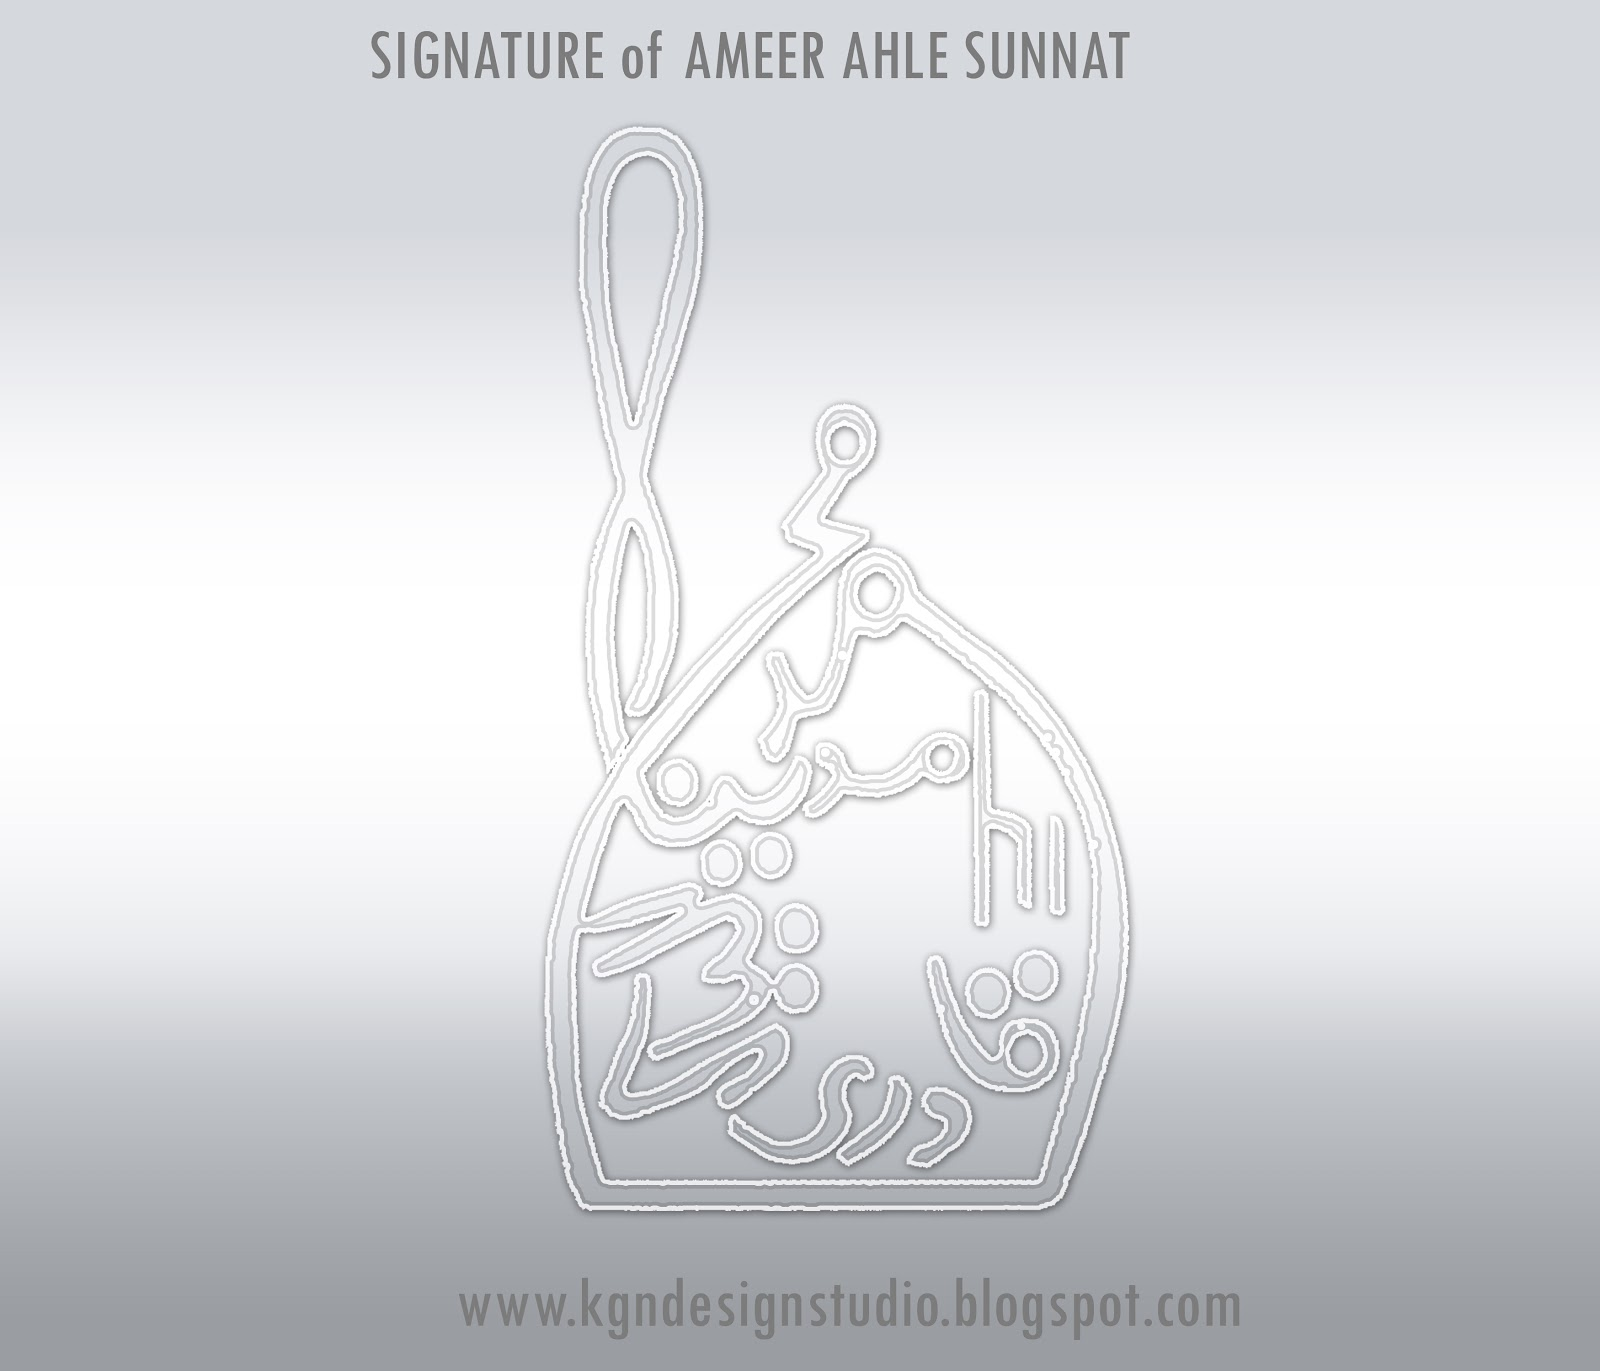 http://3.bp.blogspot.com/-xsUTX0NL6QA/UQZpYxPLFXI/AAAAAAAADBk/JF7H4EtSRbM/s1600/Signature+of+Amir+Ahle+Sunnat.jpg